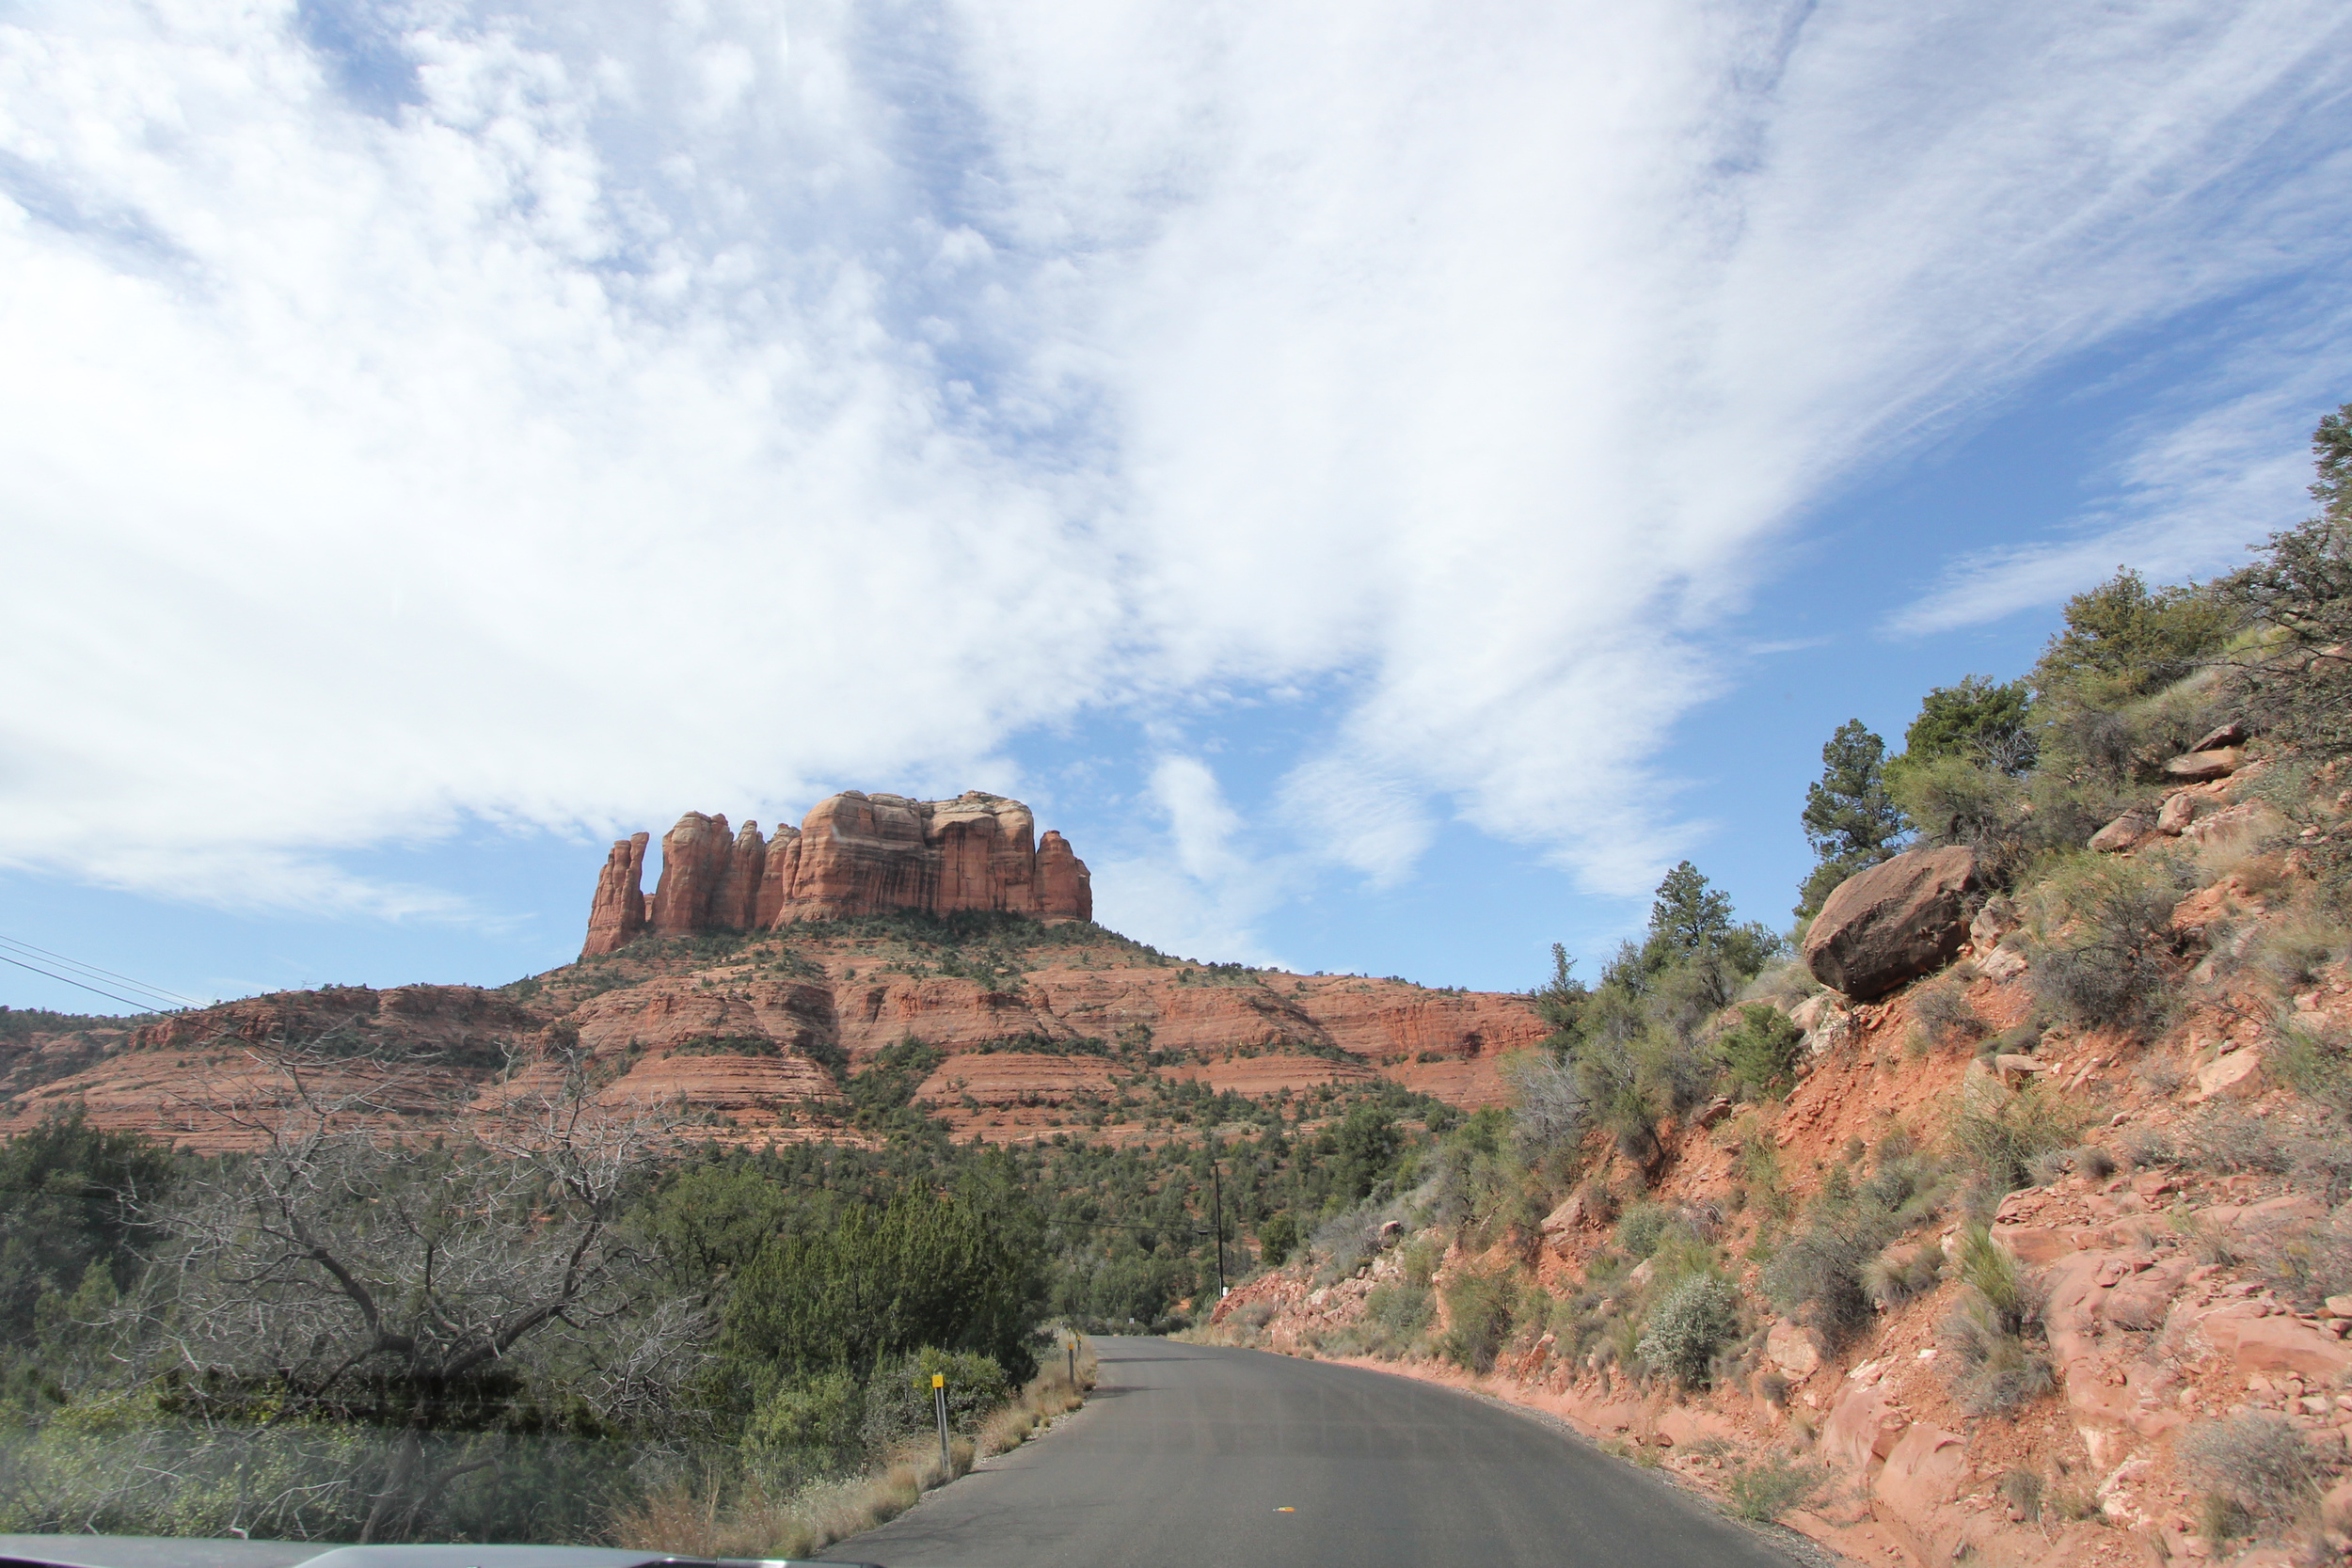 Honeymoon_Tuesday_Sedona_Arizona_JonCourvillePhotography-6.jpg